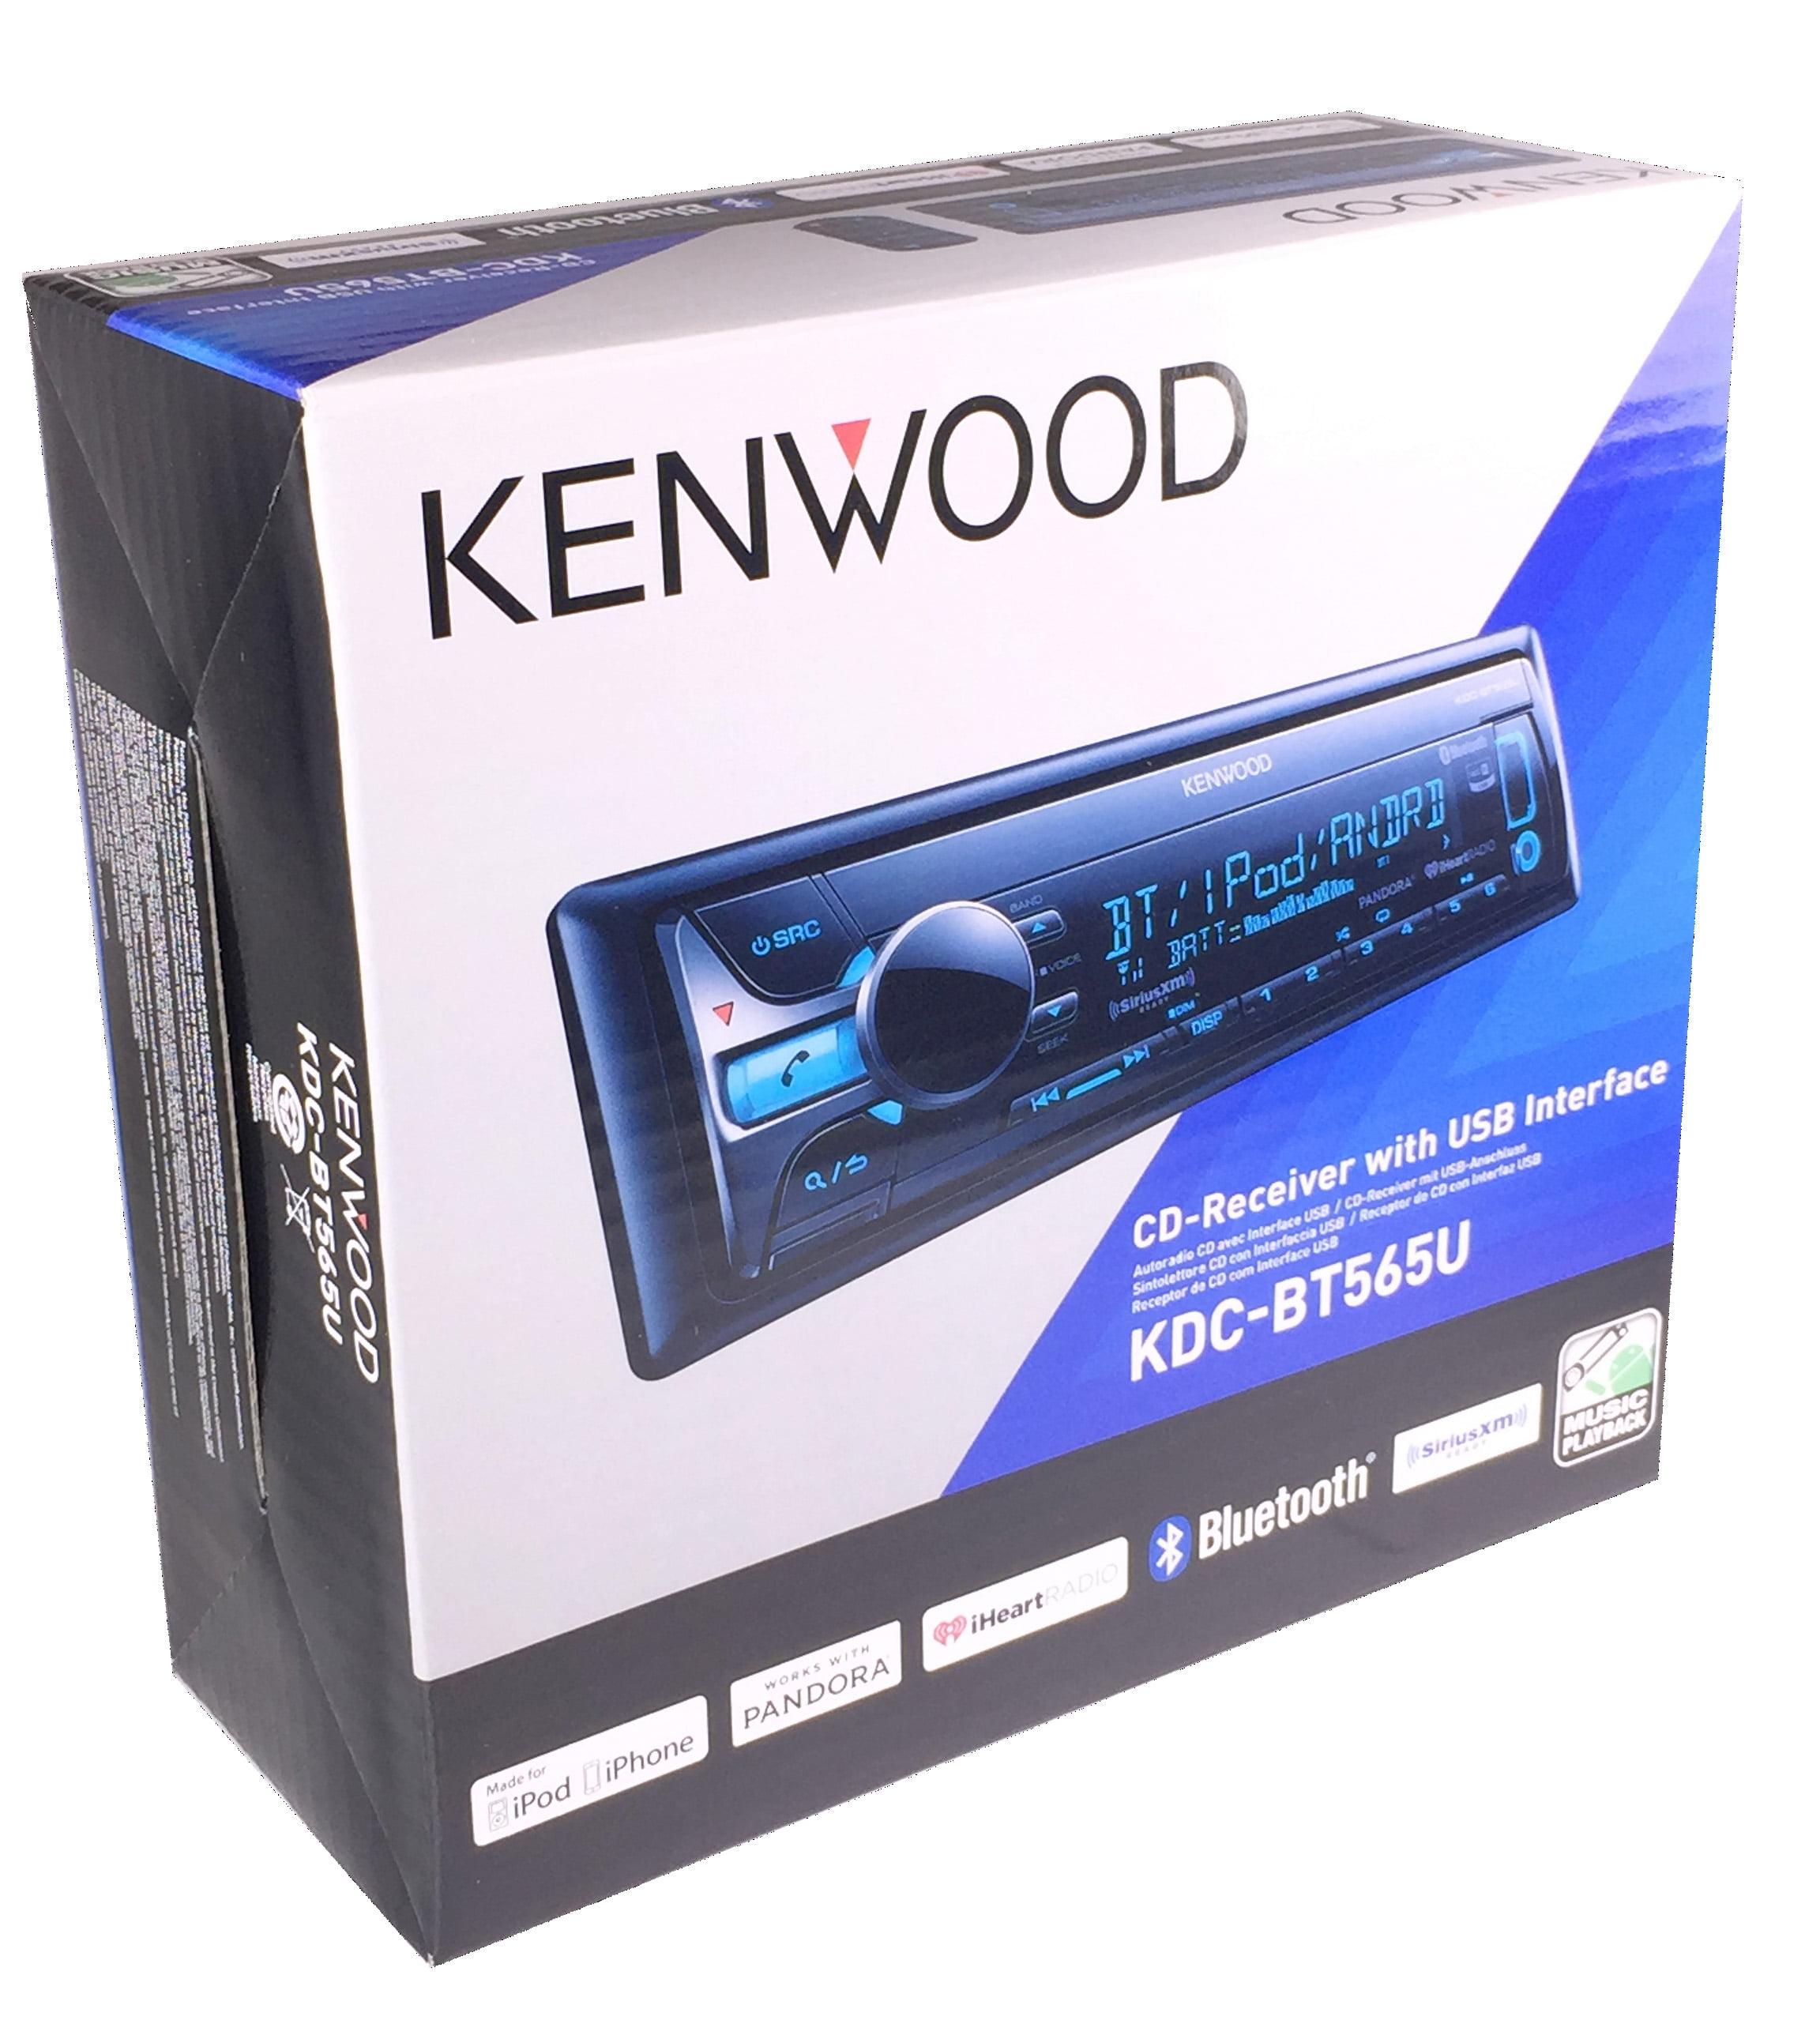 kenwood KDCBT565U CD Single DIN In-Dash Bluetooth Car Stereo Receiver by Kenwood